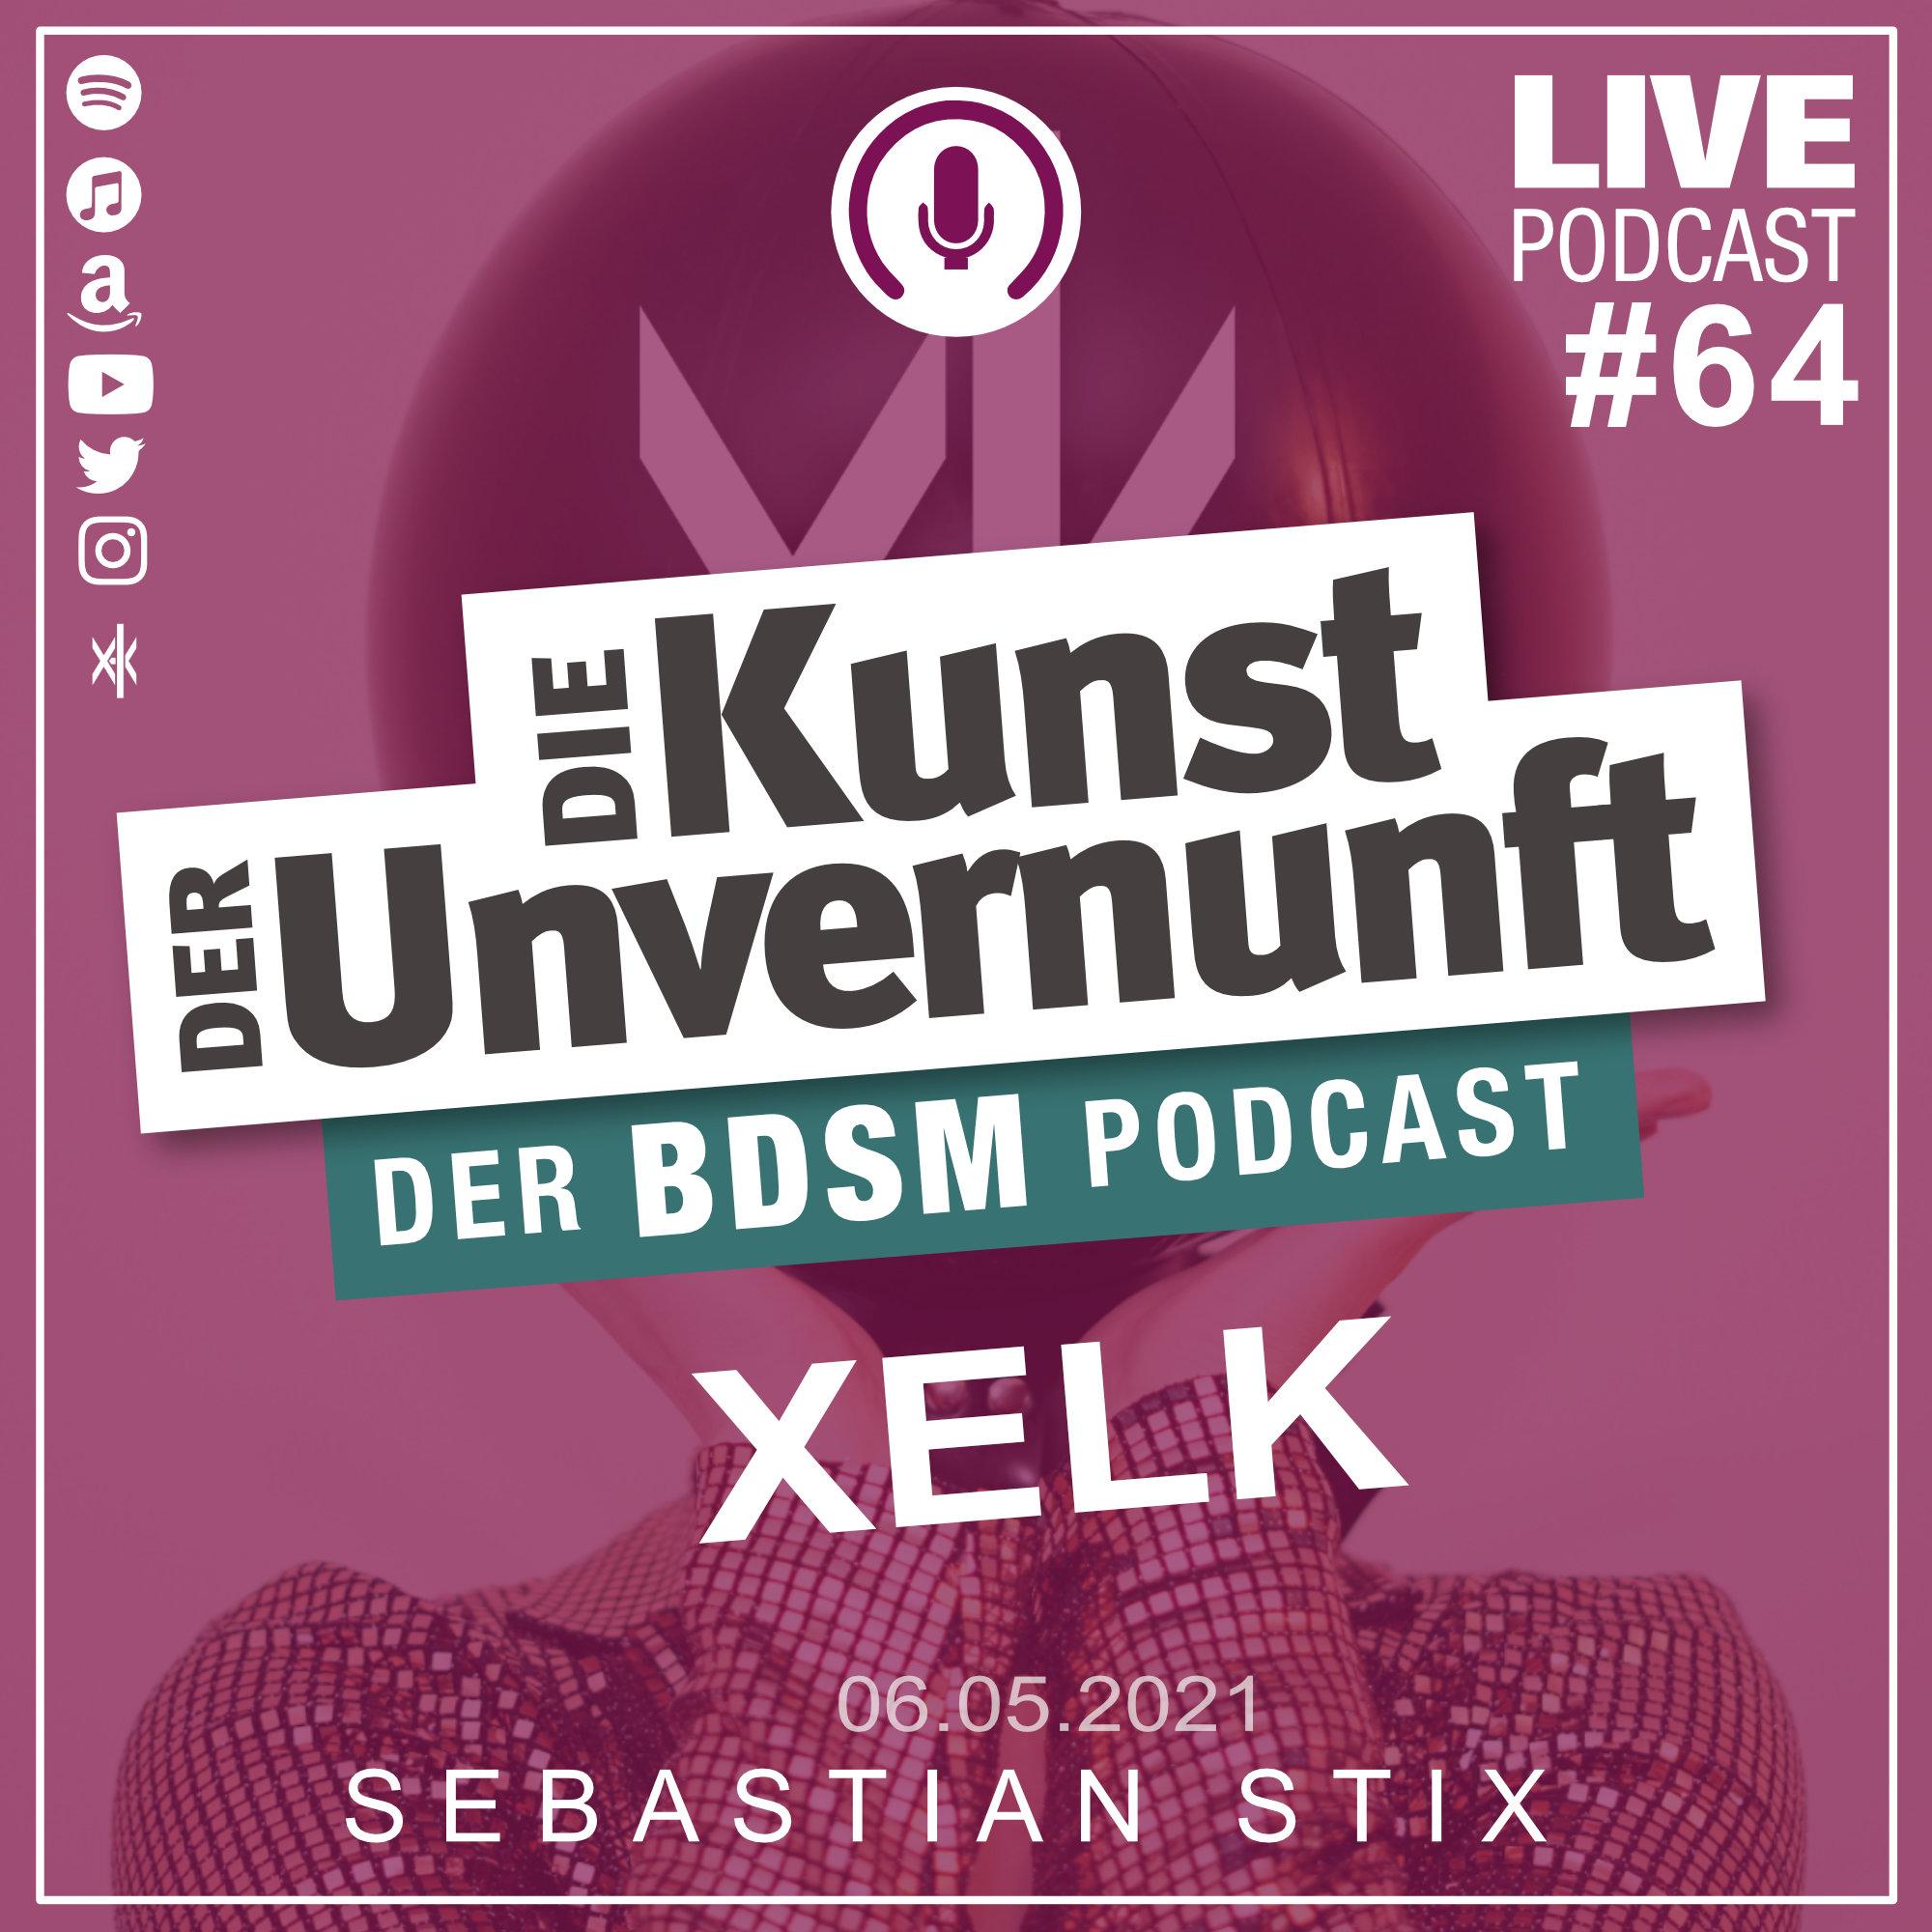 Unvernunft Live 06.05.2021 - XELK - Hamburger Kollektiv